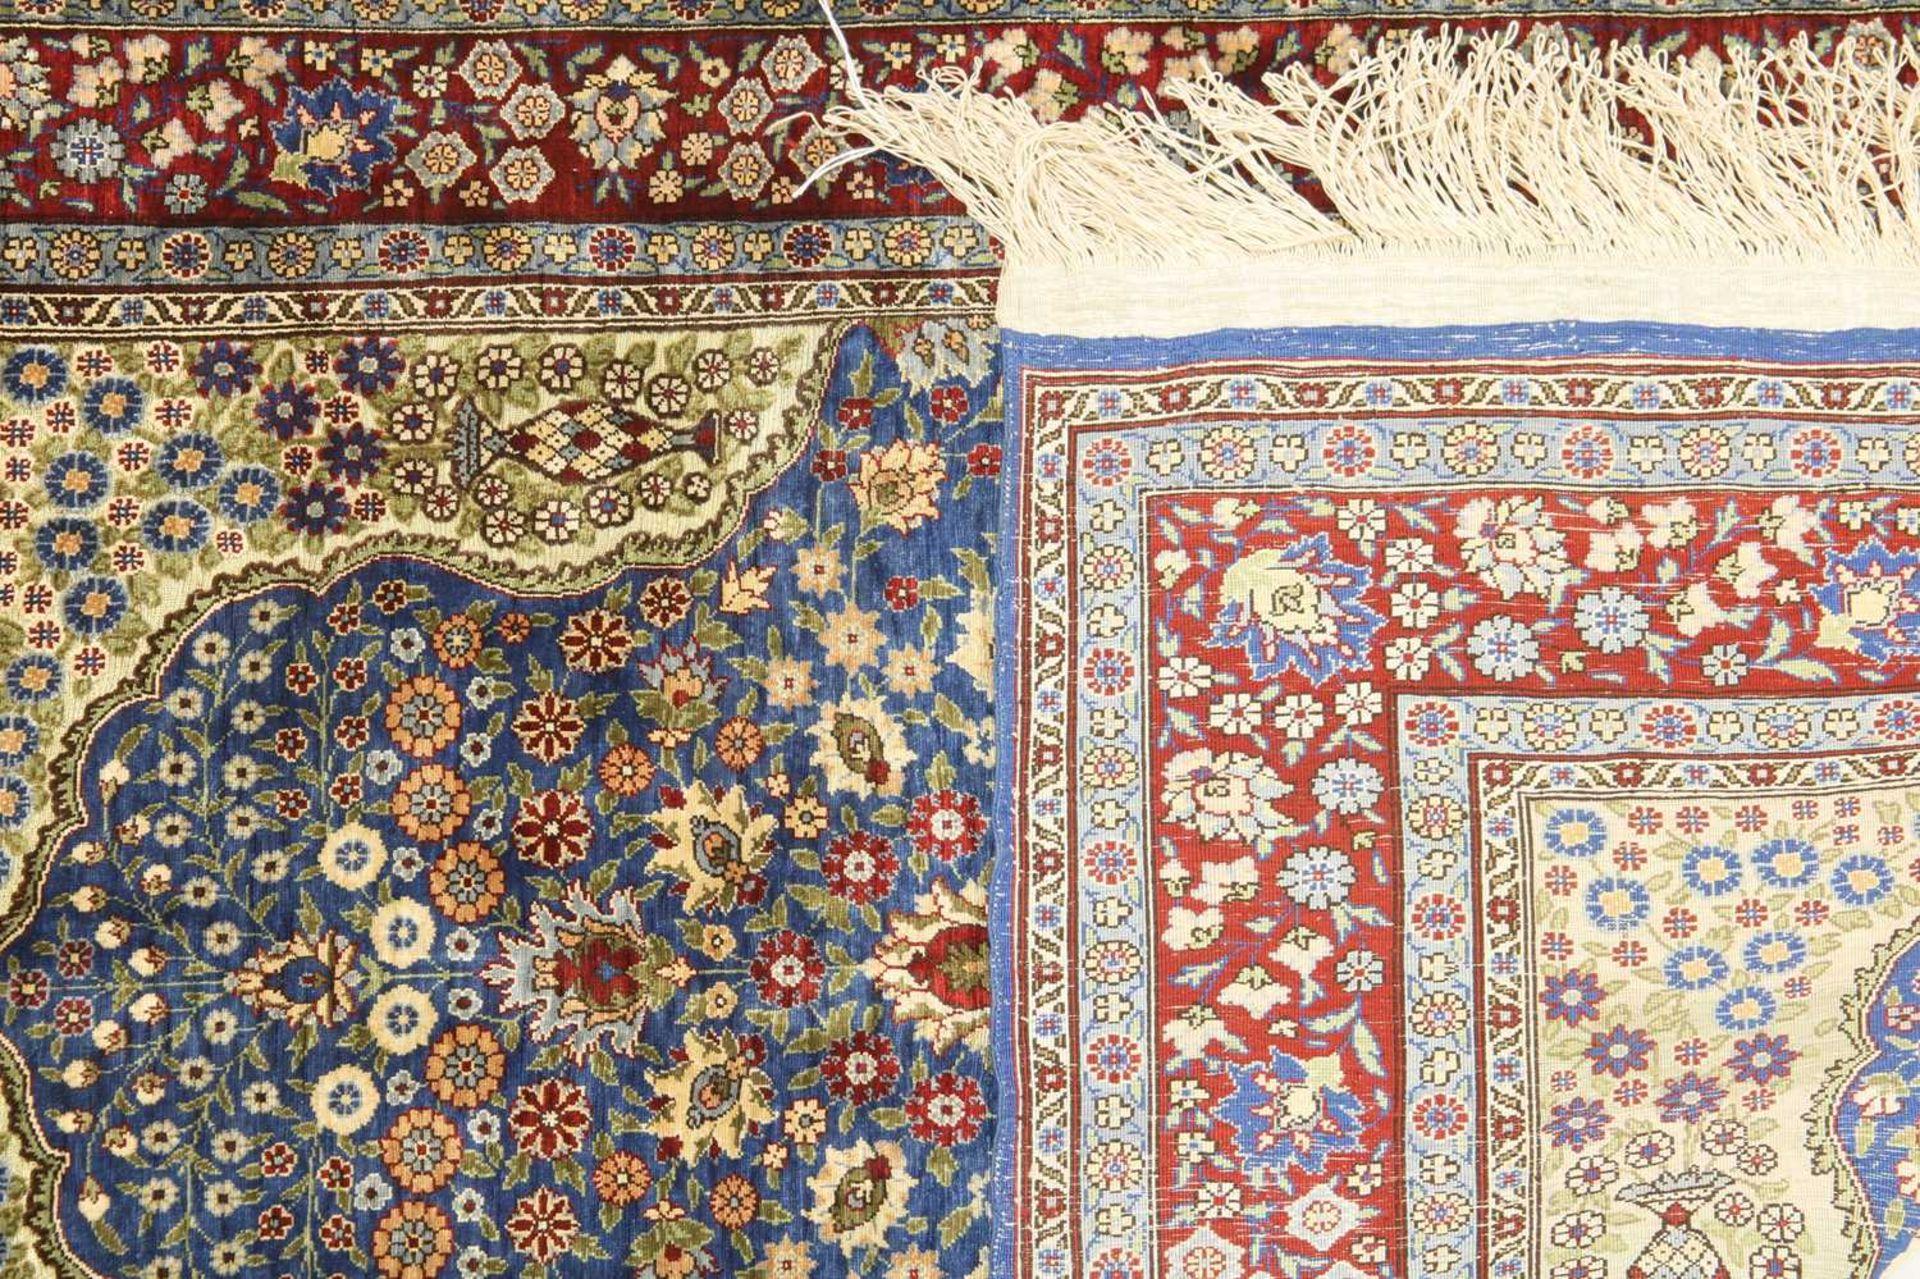 A Turkish silk and metal Hereke rug, - Image 2 of 2